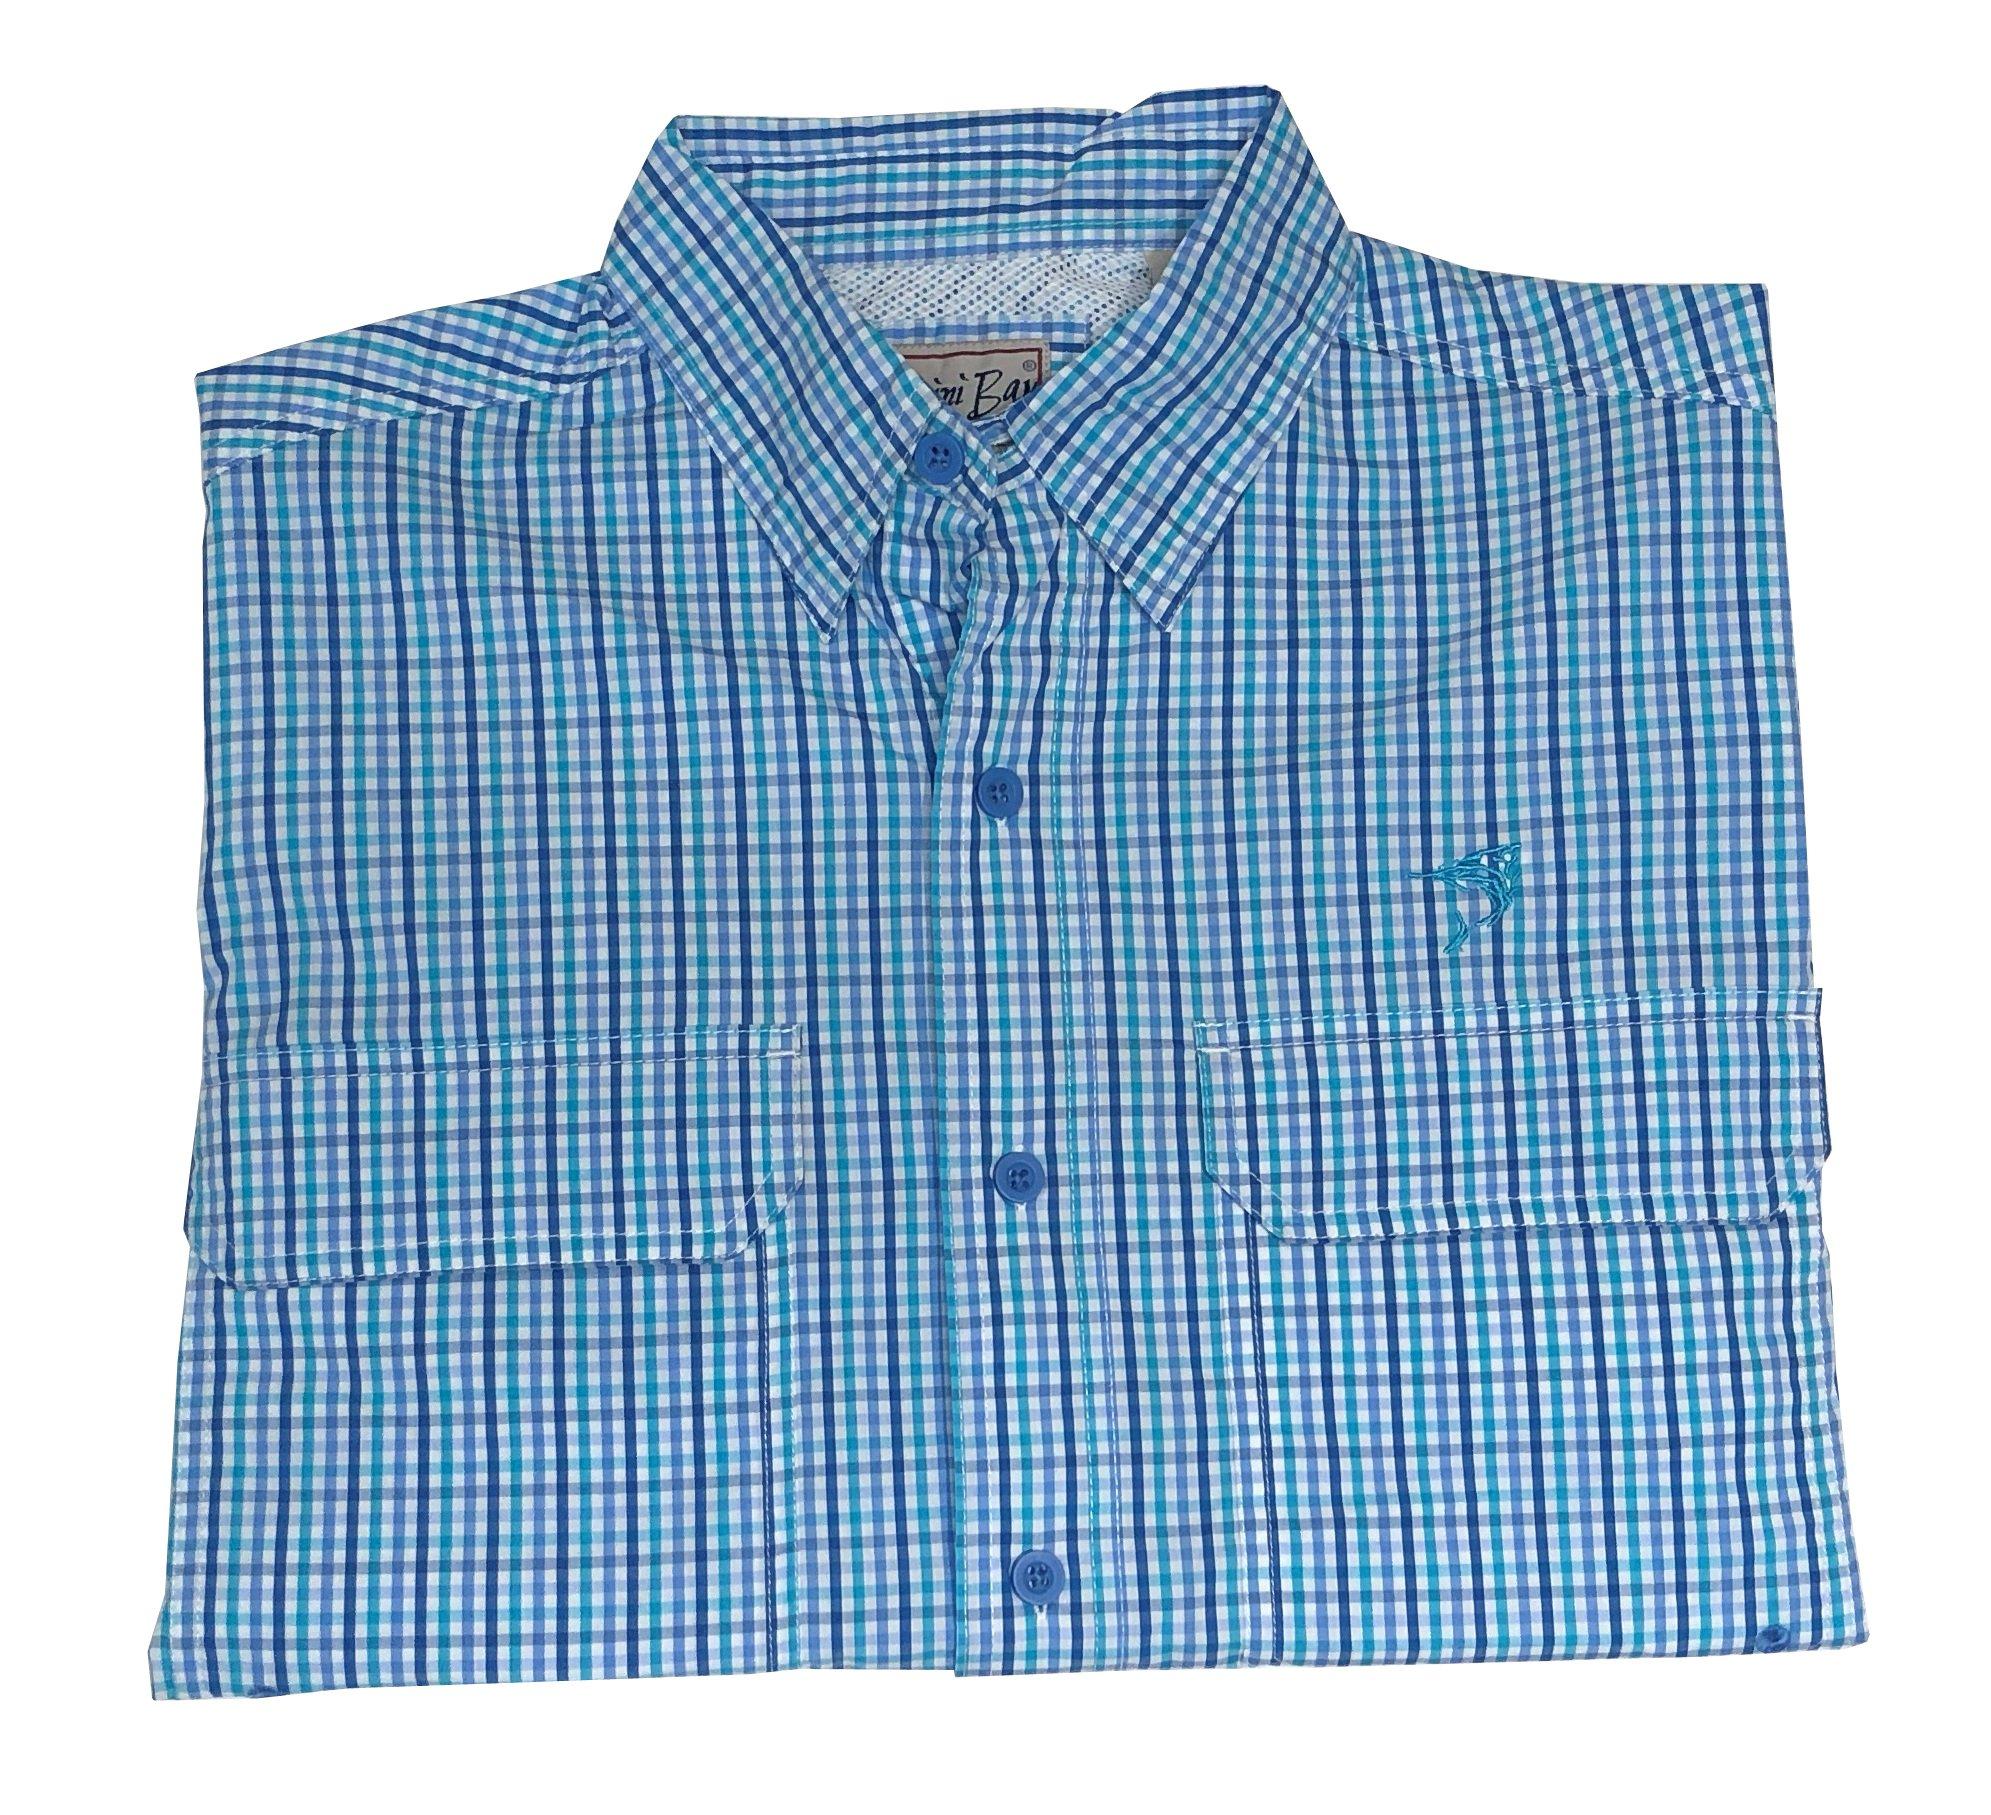 Bimini Bay Outfitters Pine Island Plaid Short Sleeve Shirt (Large, Marina) by Bimini Bay Outfitters